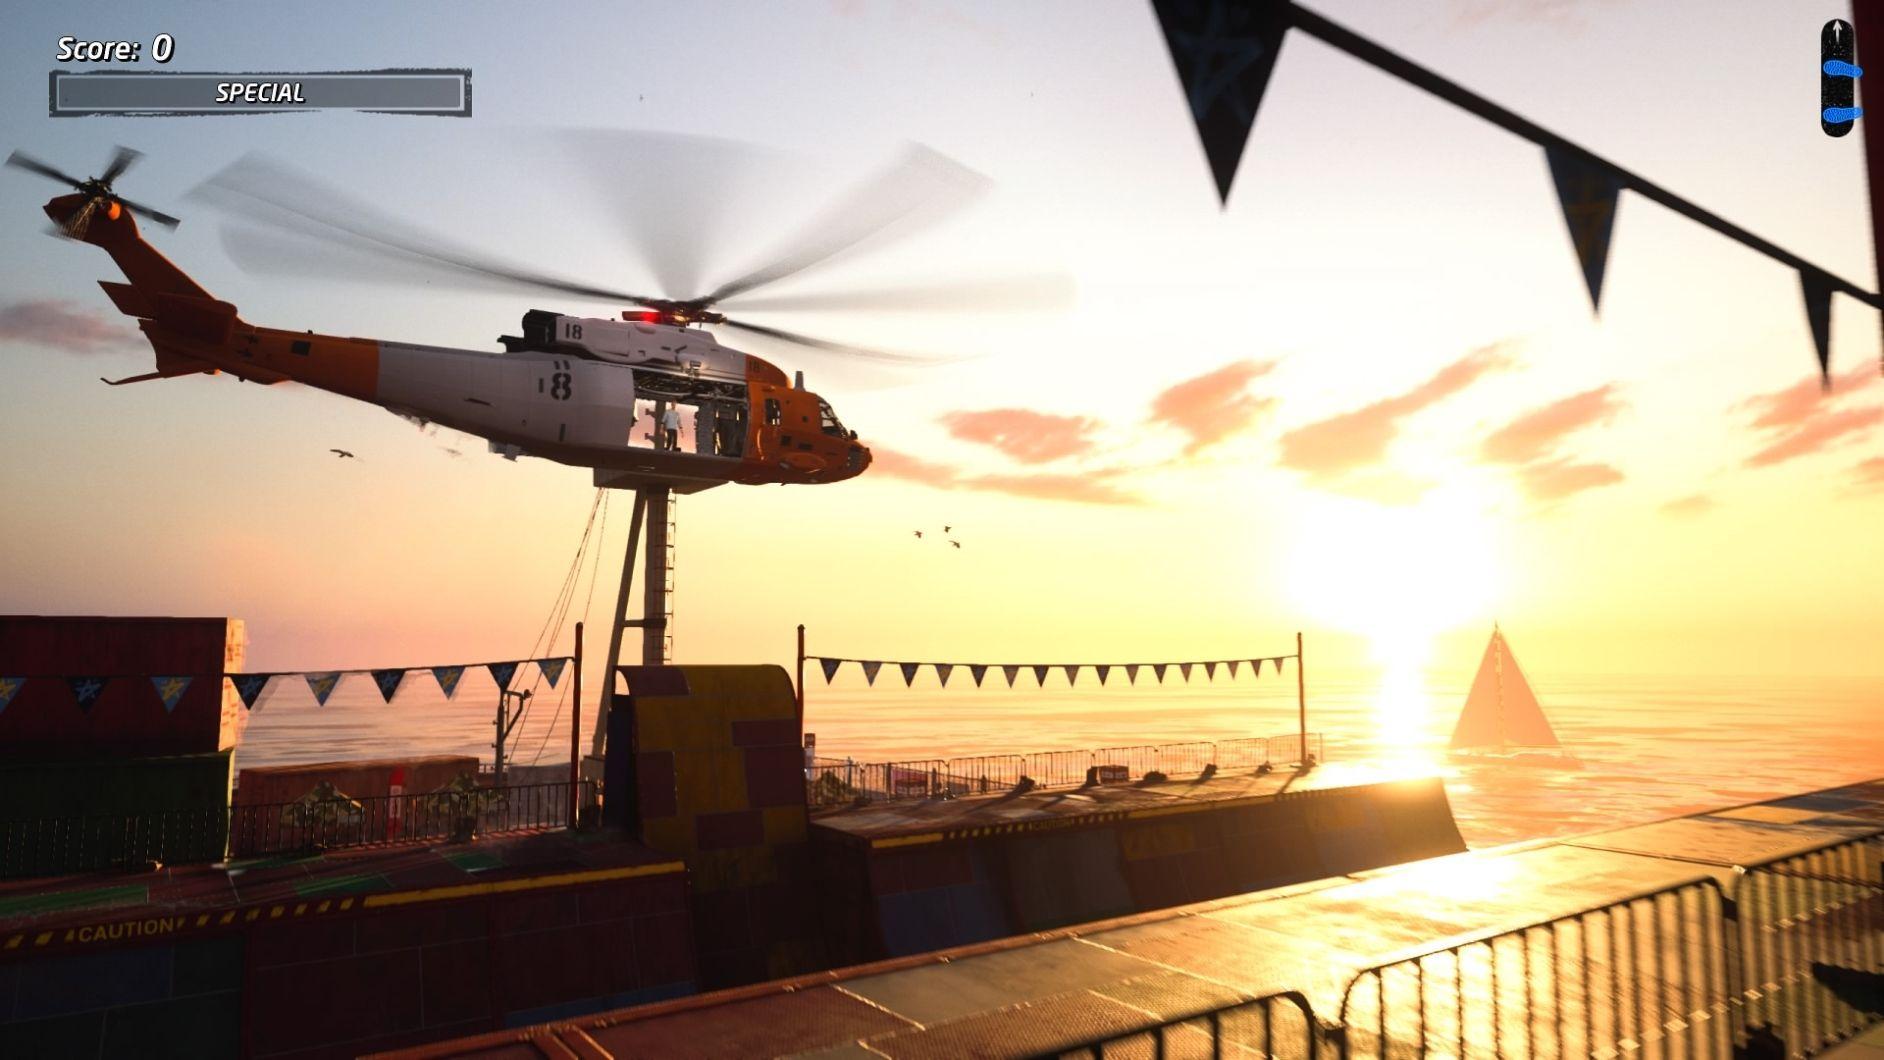 Tony Hawk Helikopter